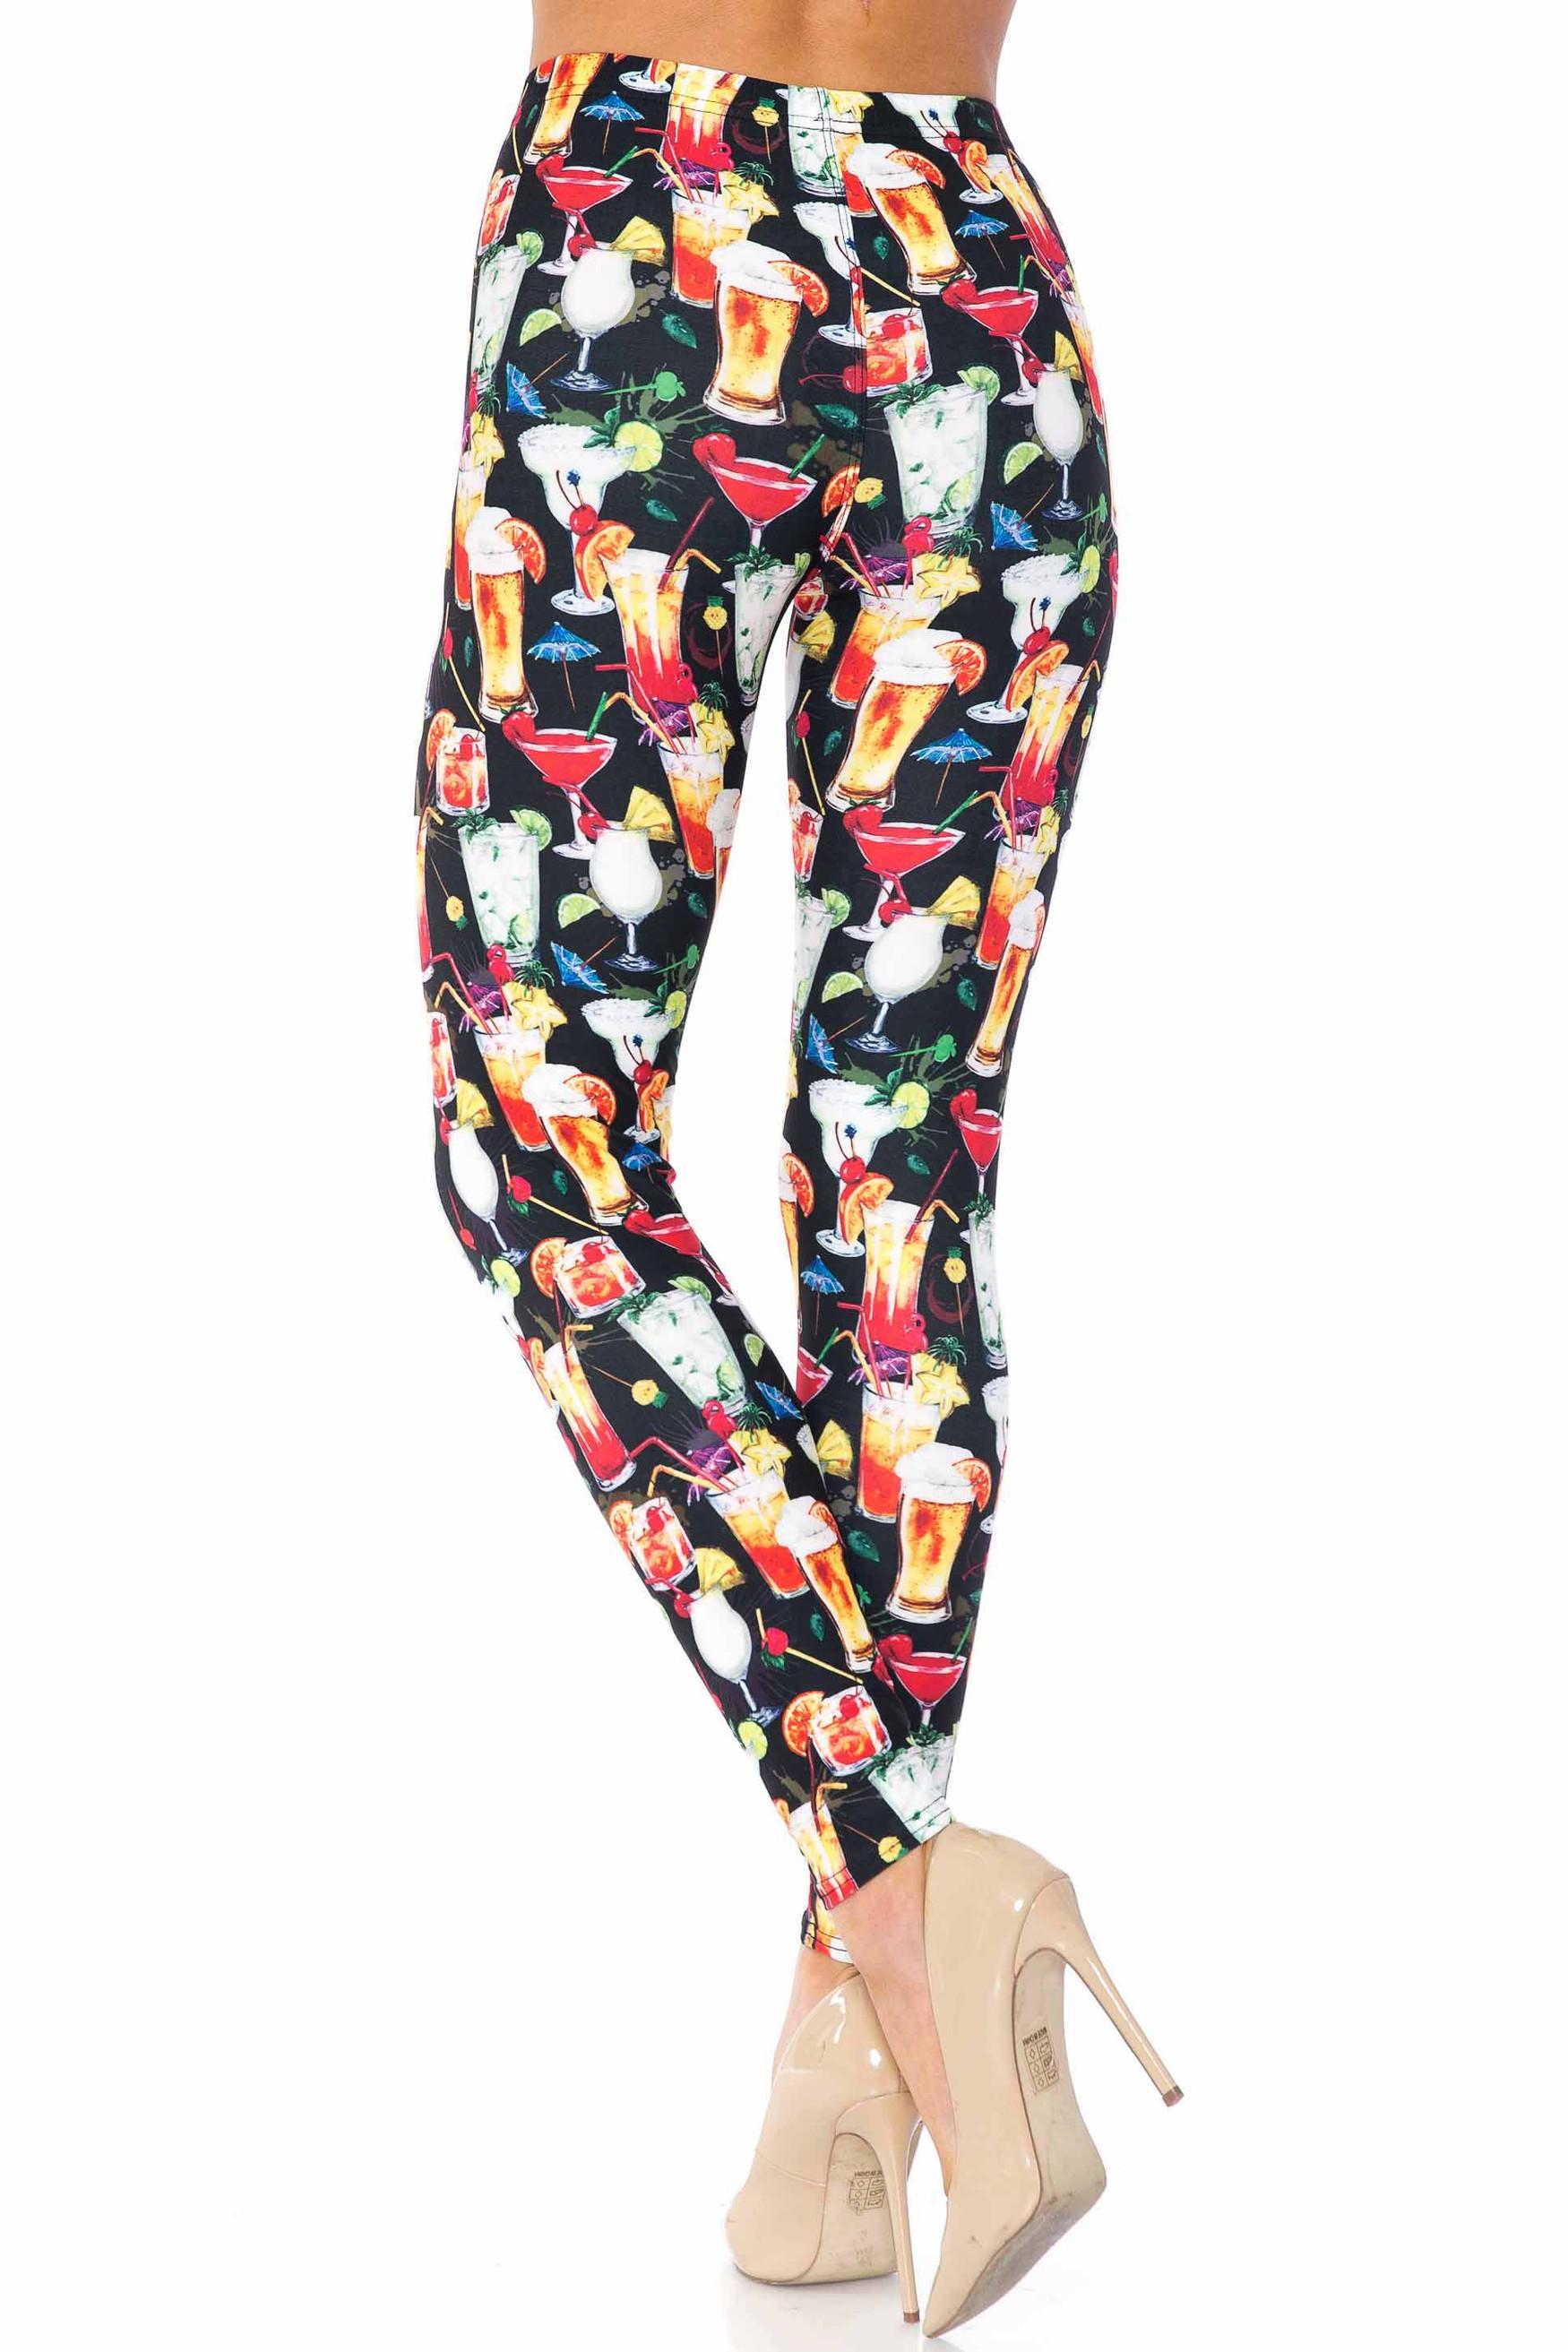 Creamy Soft Tropical Mocktail Kids Leggings - USA Fashion™